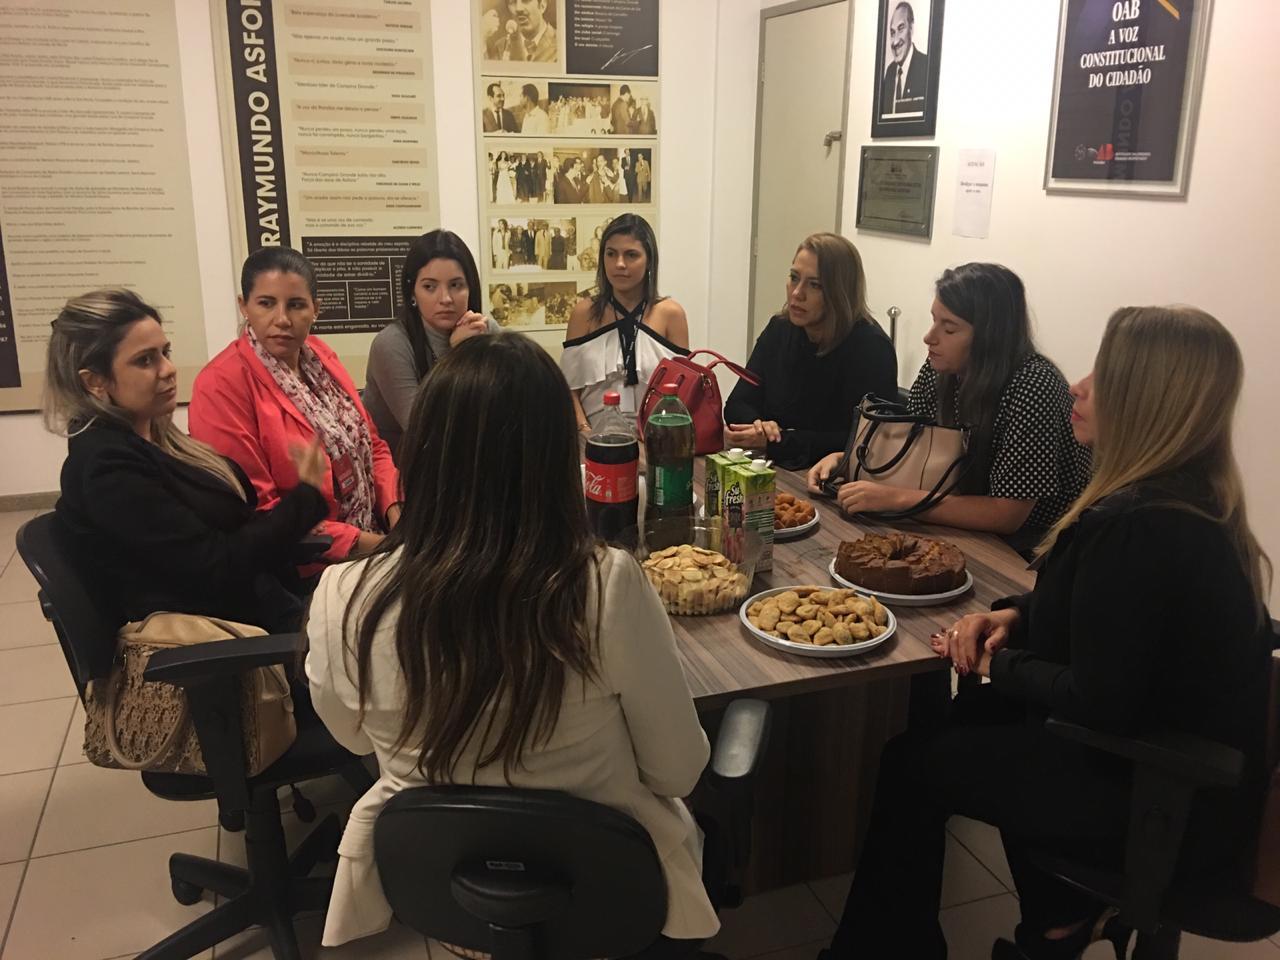 Mês da Mulher: OAB-PB realiza lanche da tarde no Fórum Criminal